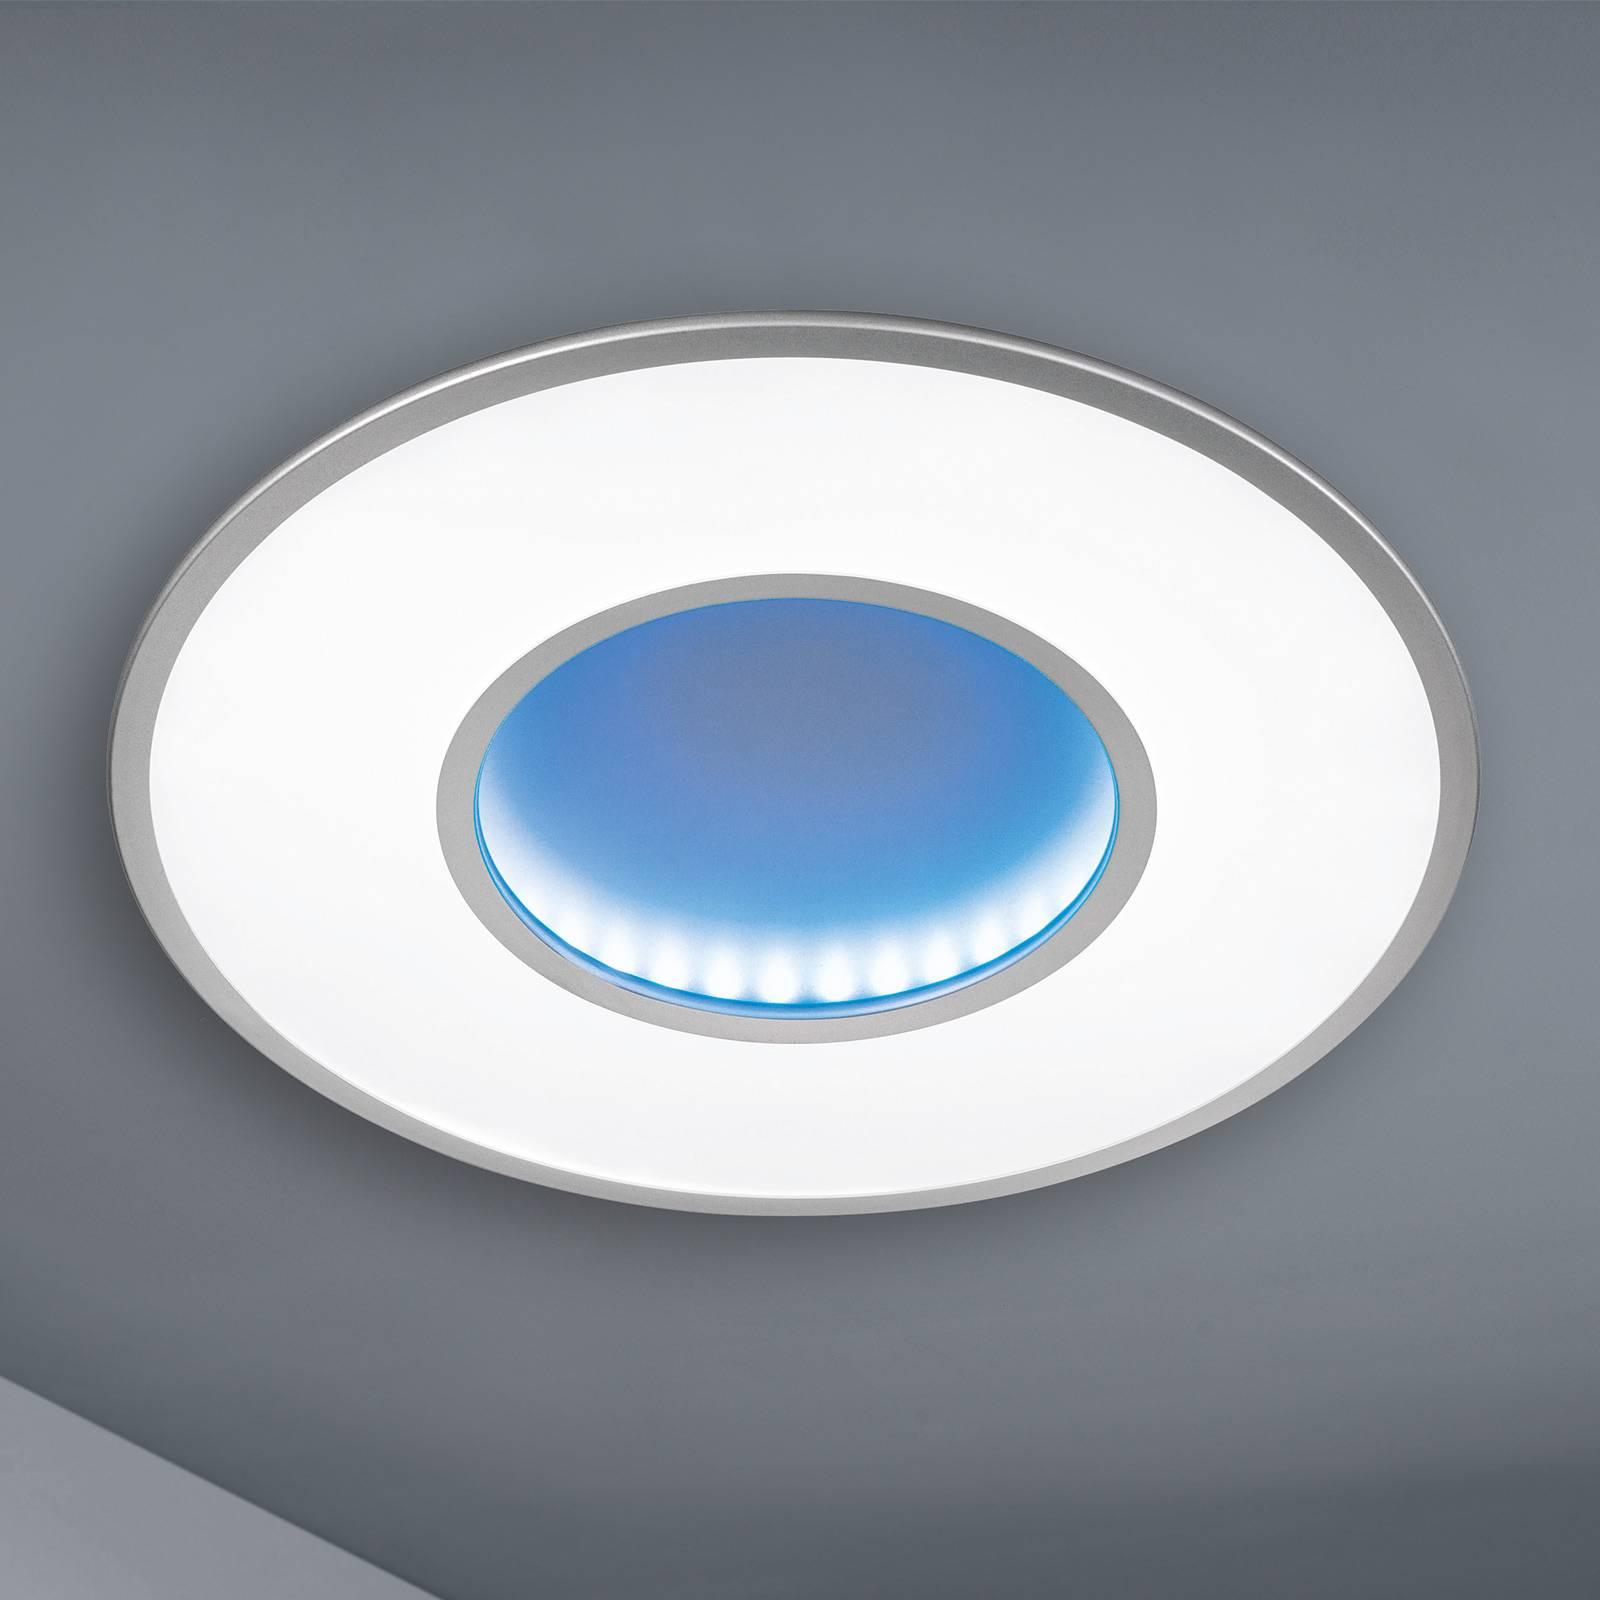 LED plafondlamp Jona met afstandsbediening